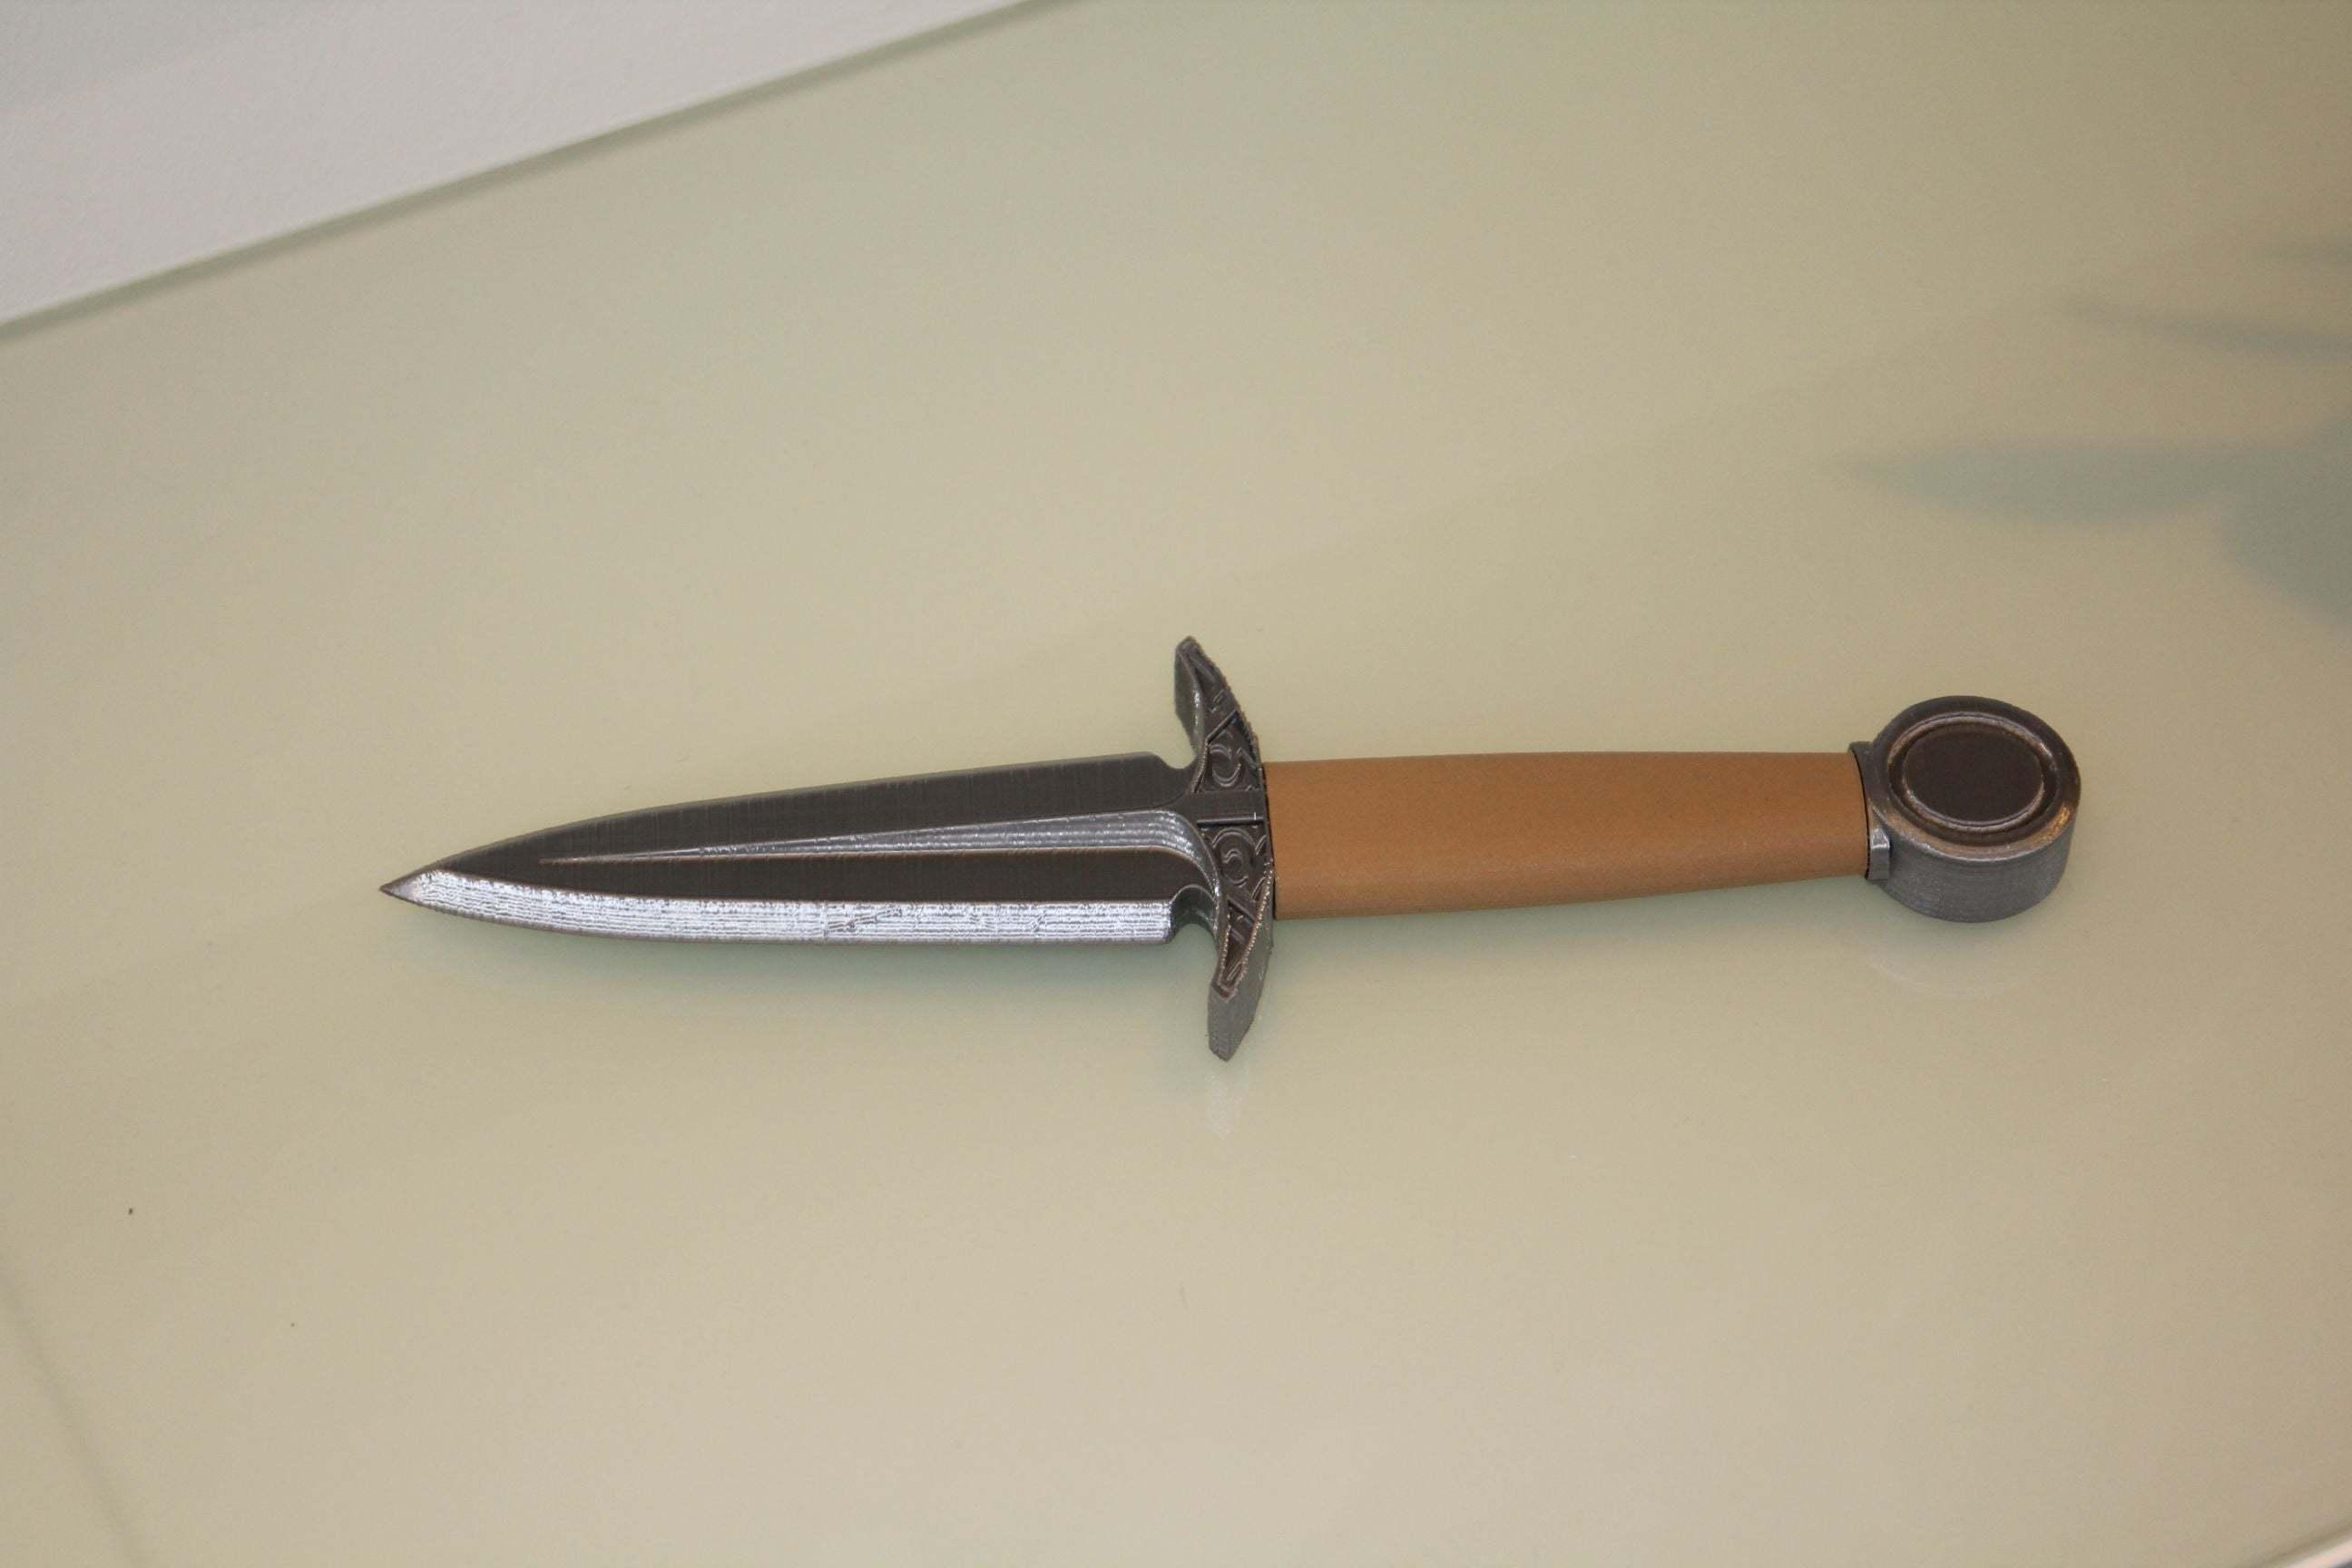 dagger4.jpg Download free STL file Dagger - easy to print, no support • 3D printable model, plokr